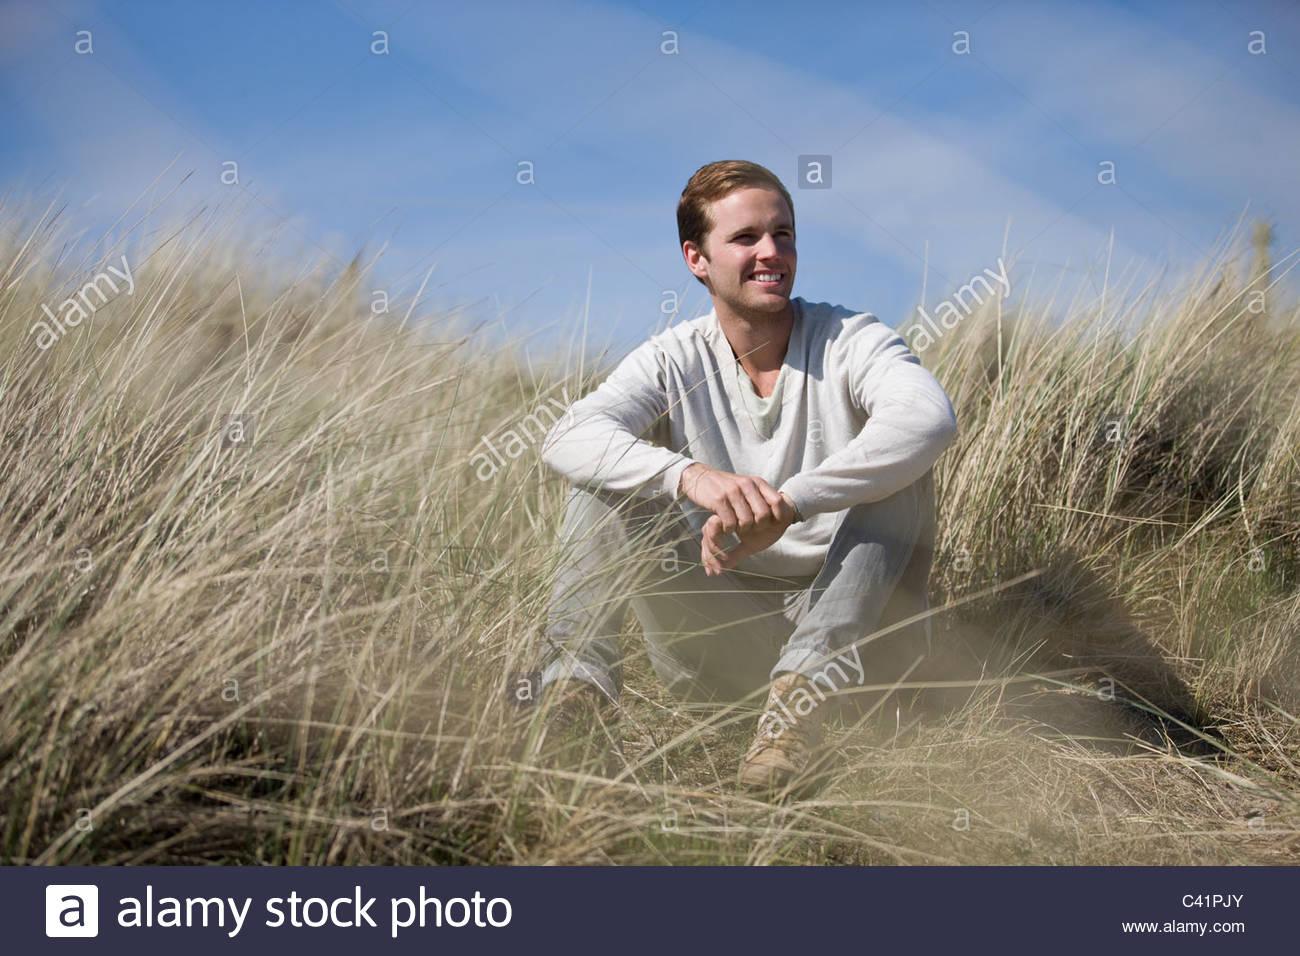 Ein junger Mann sitzt zwischen den Sand Dünen, Lächeln Stockbild